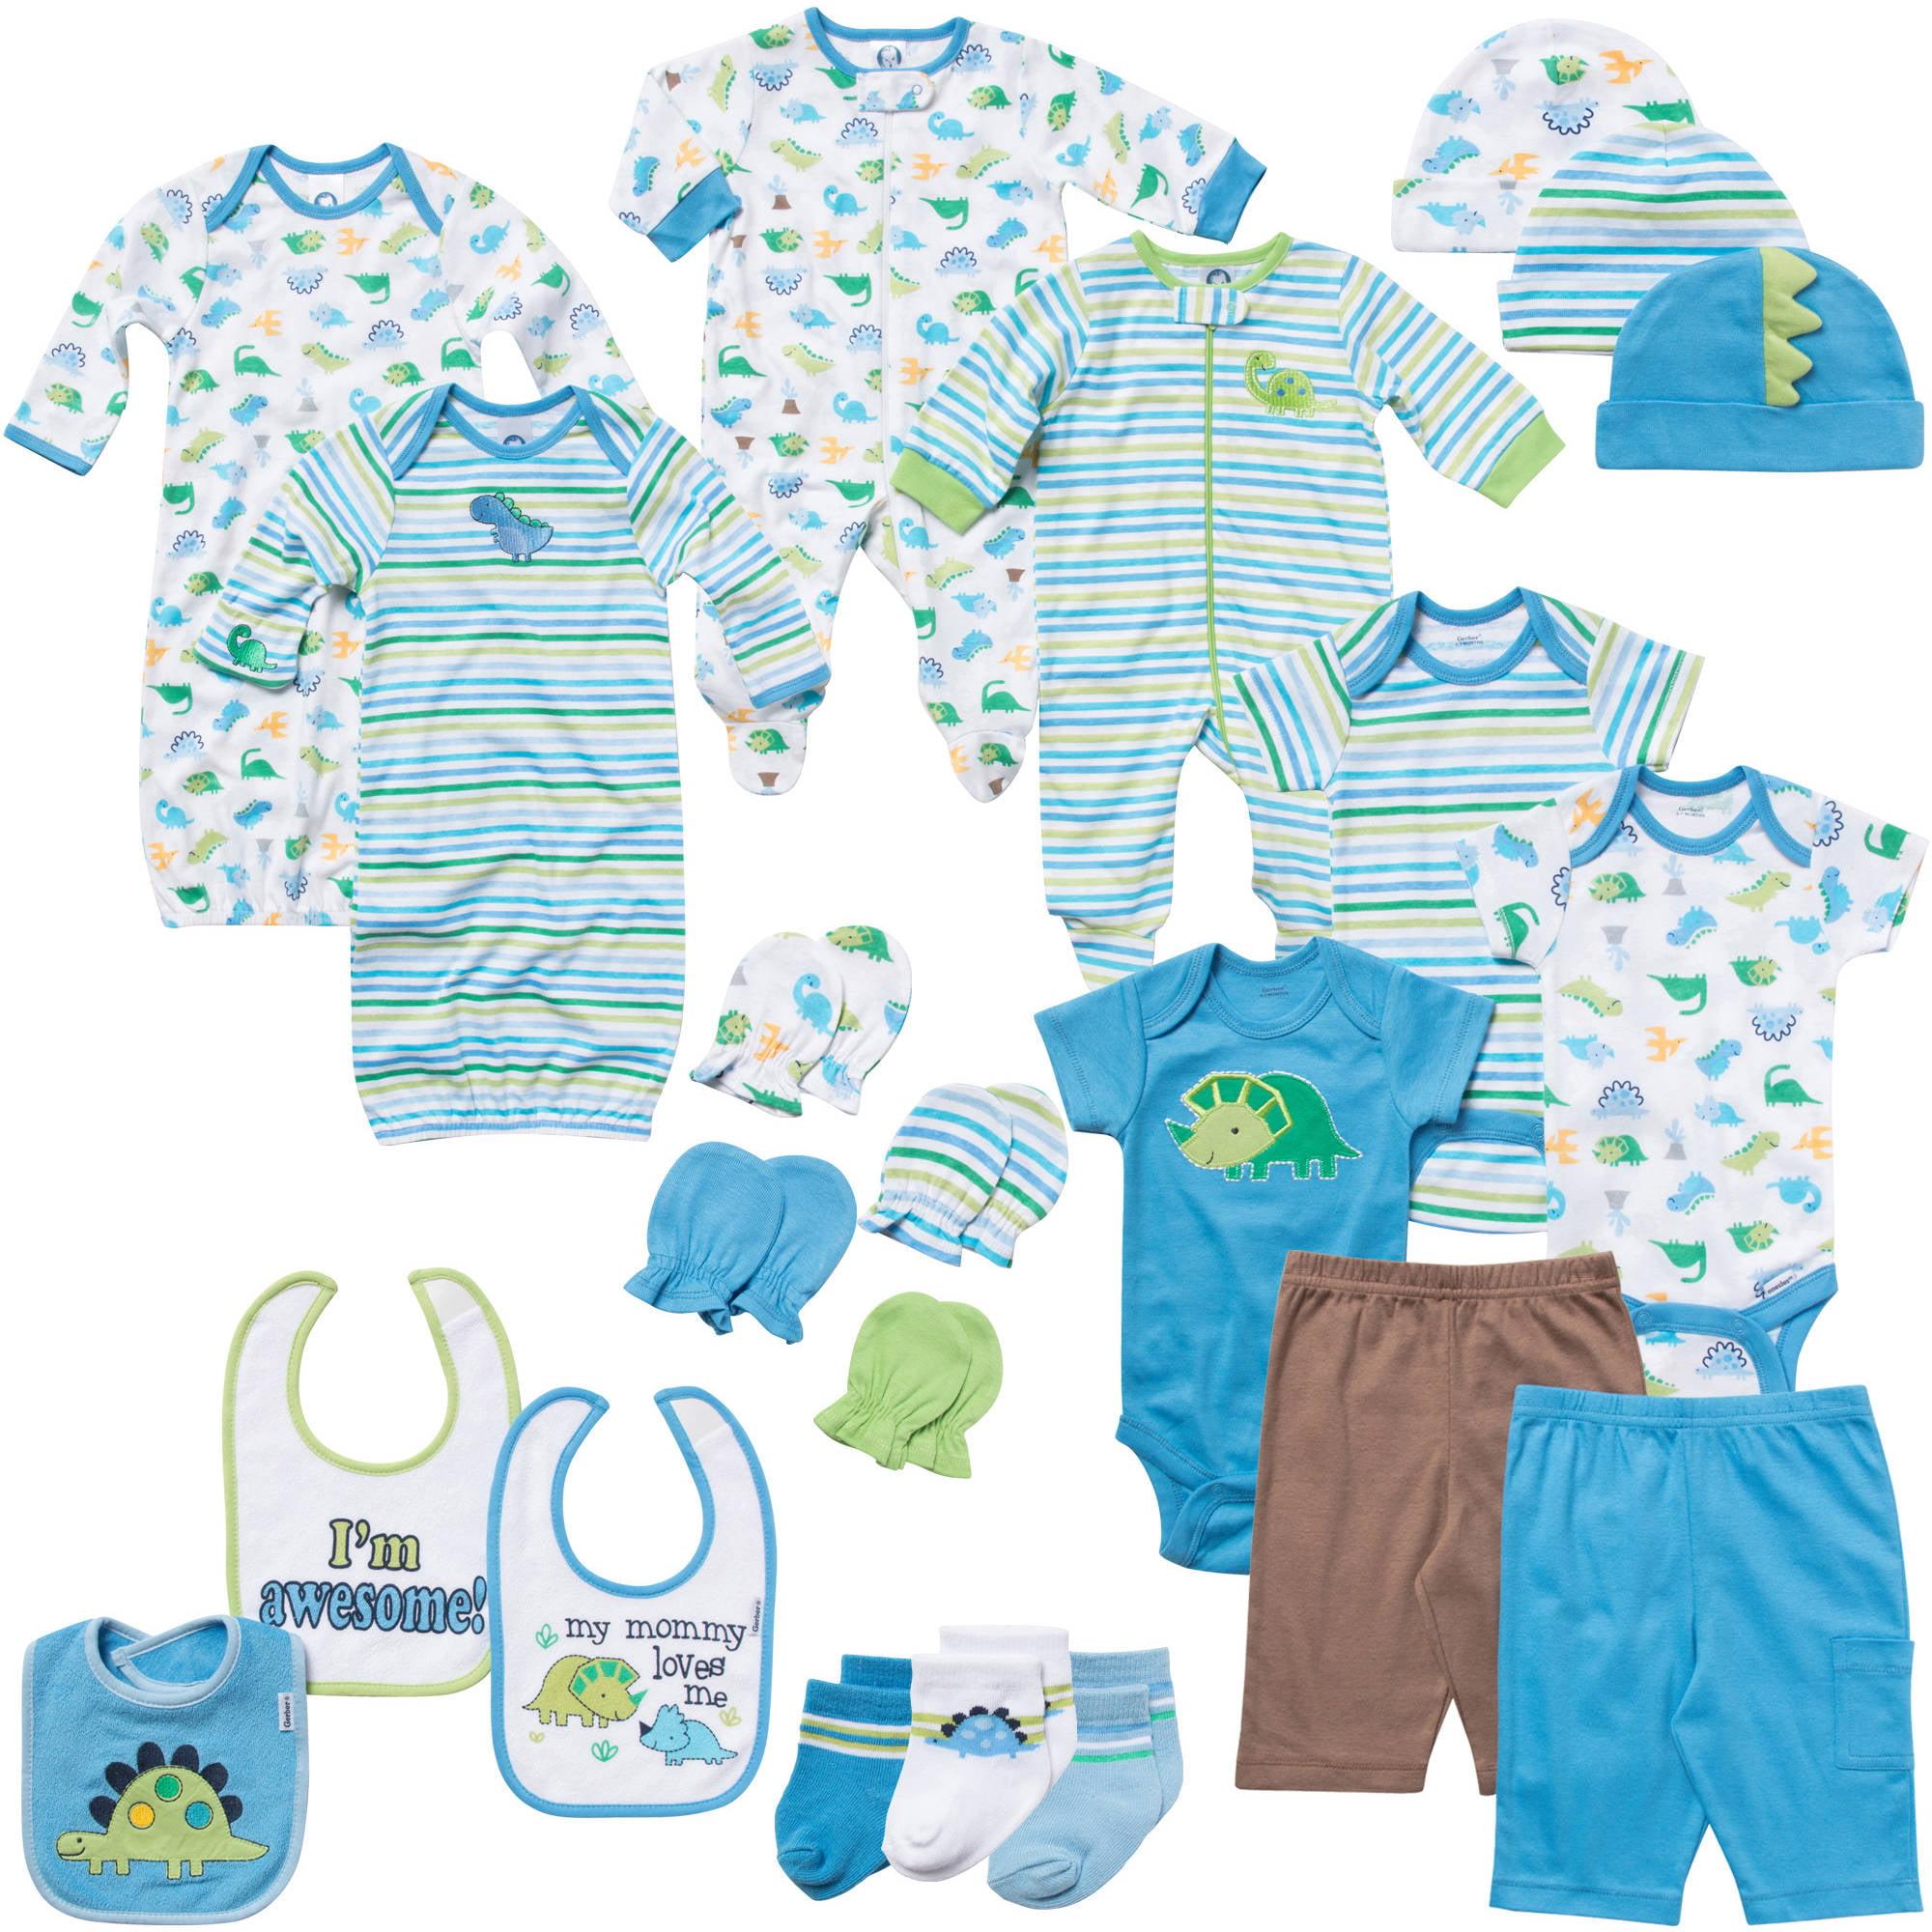 Gerber Newborn Baby Boy 22-Piece Perfect Baby Shower Gift Layette Set Size 0-3M Blue - Walmart.com